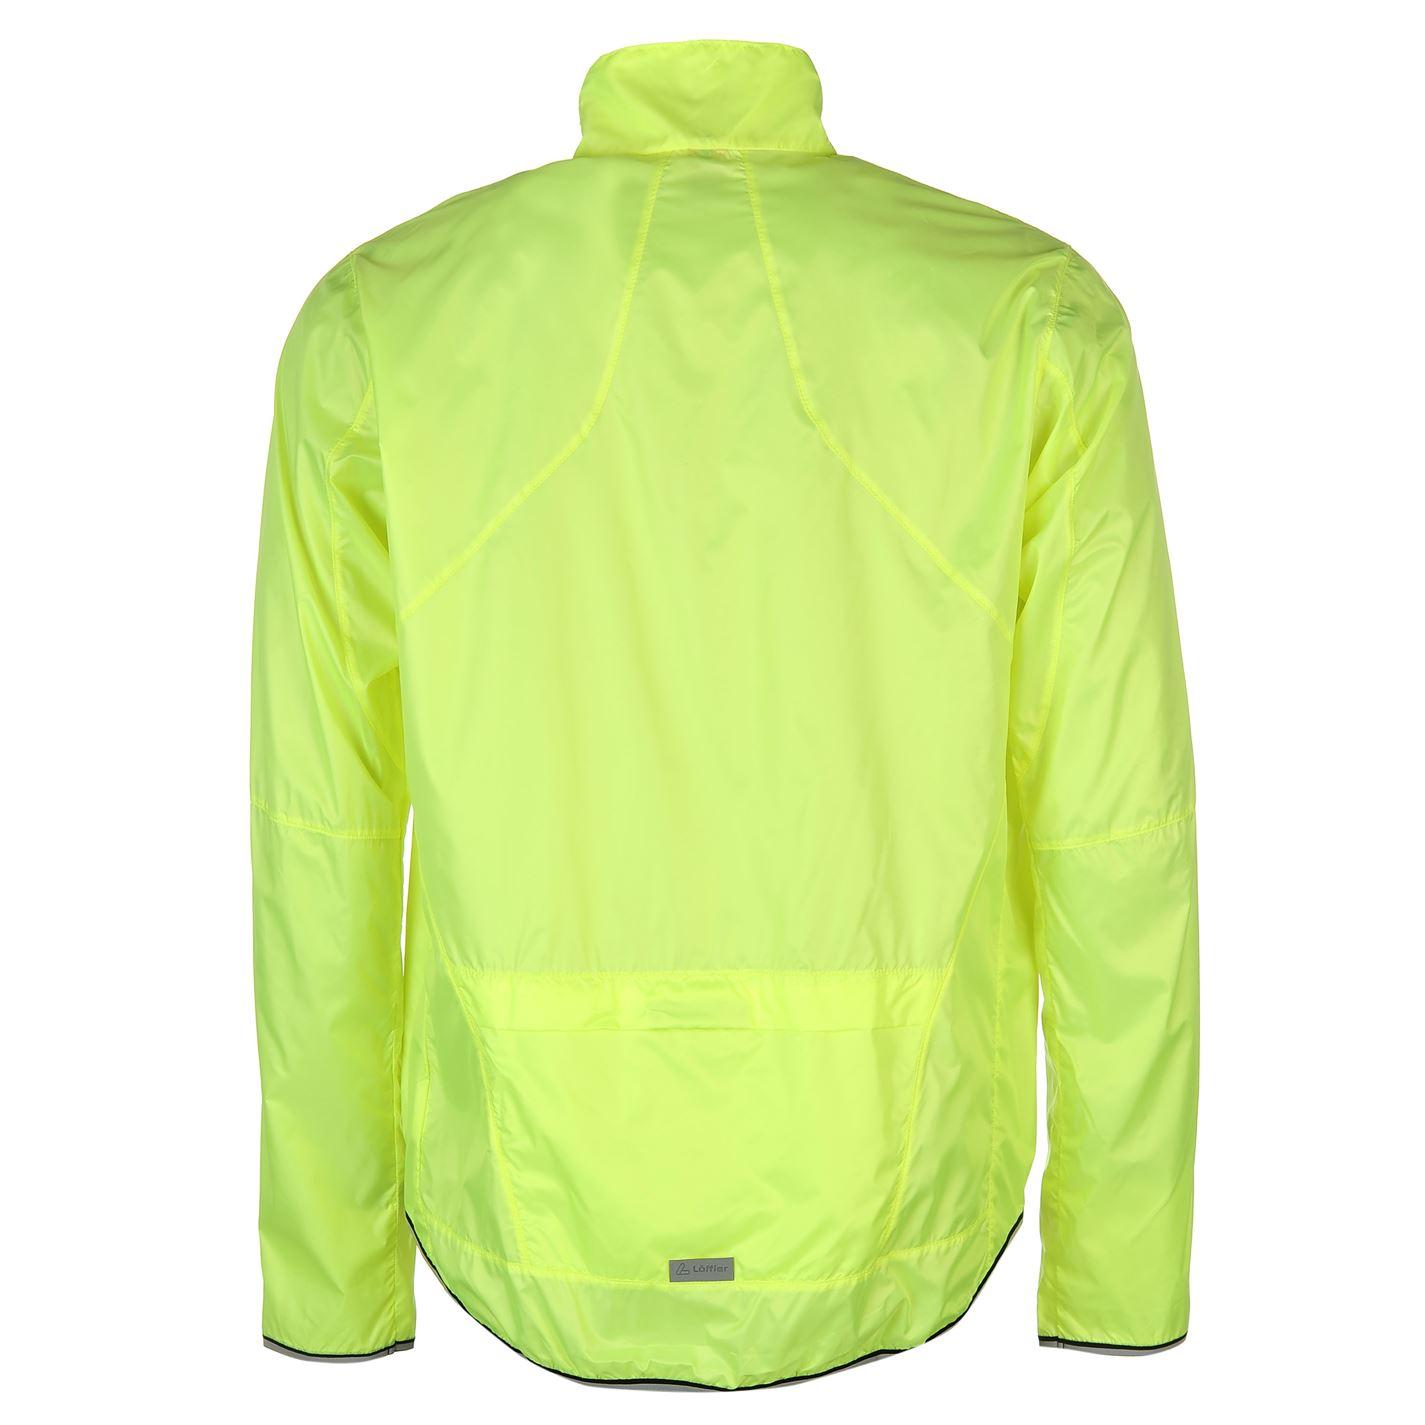 Löffler Cycling Windshell Jacket Mens